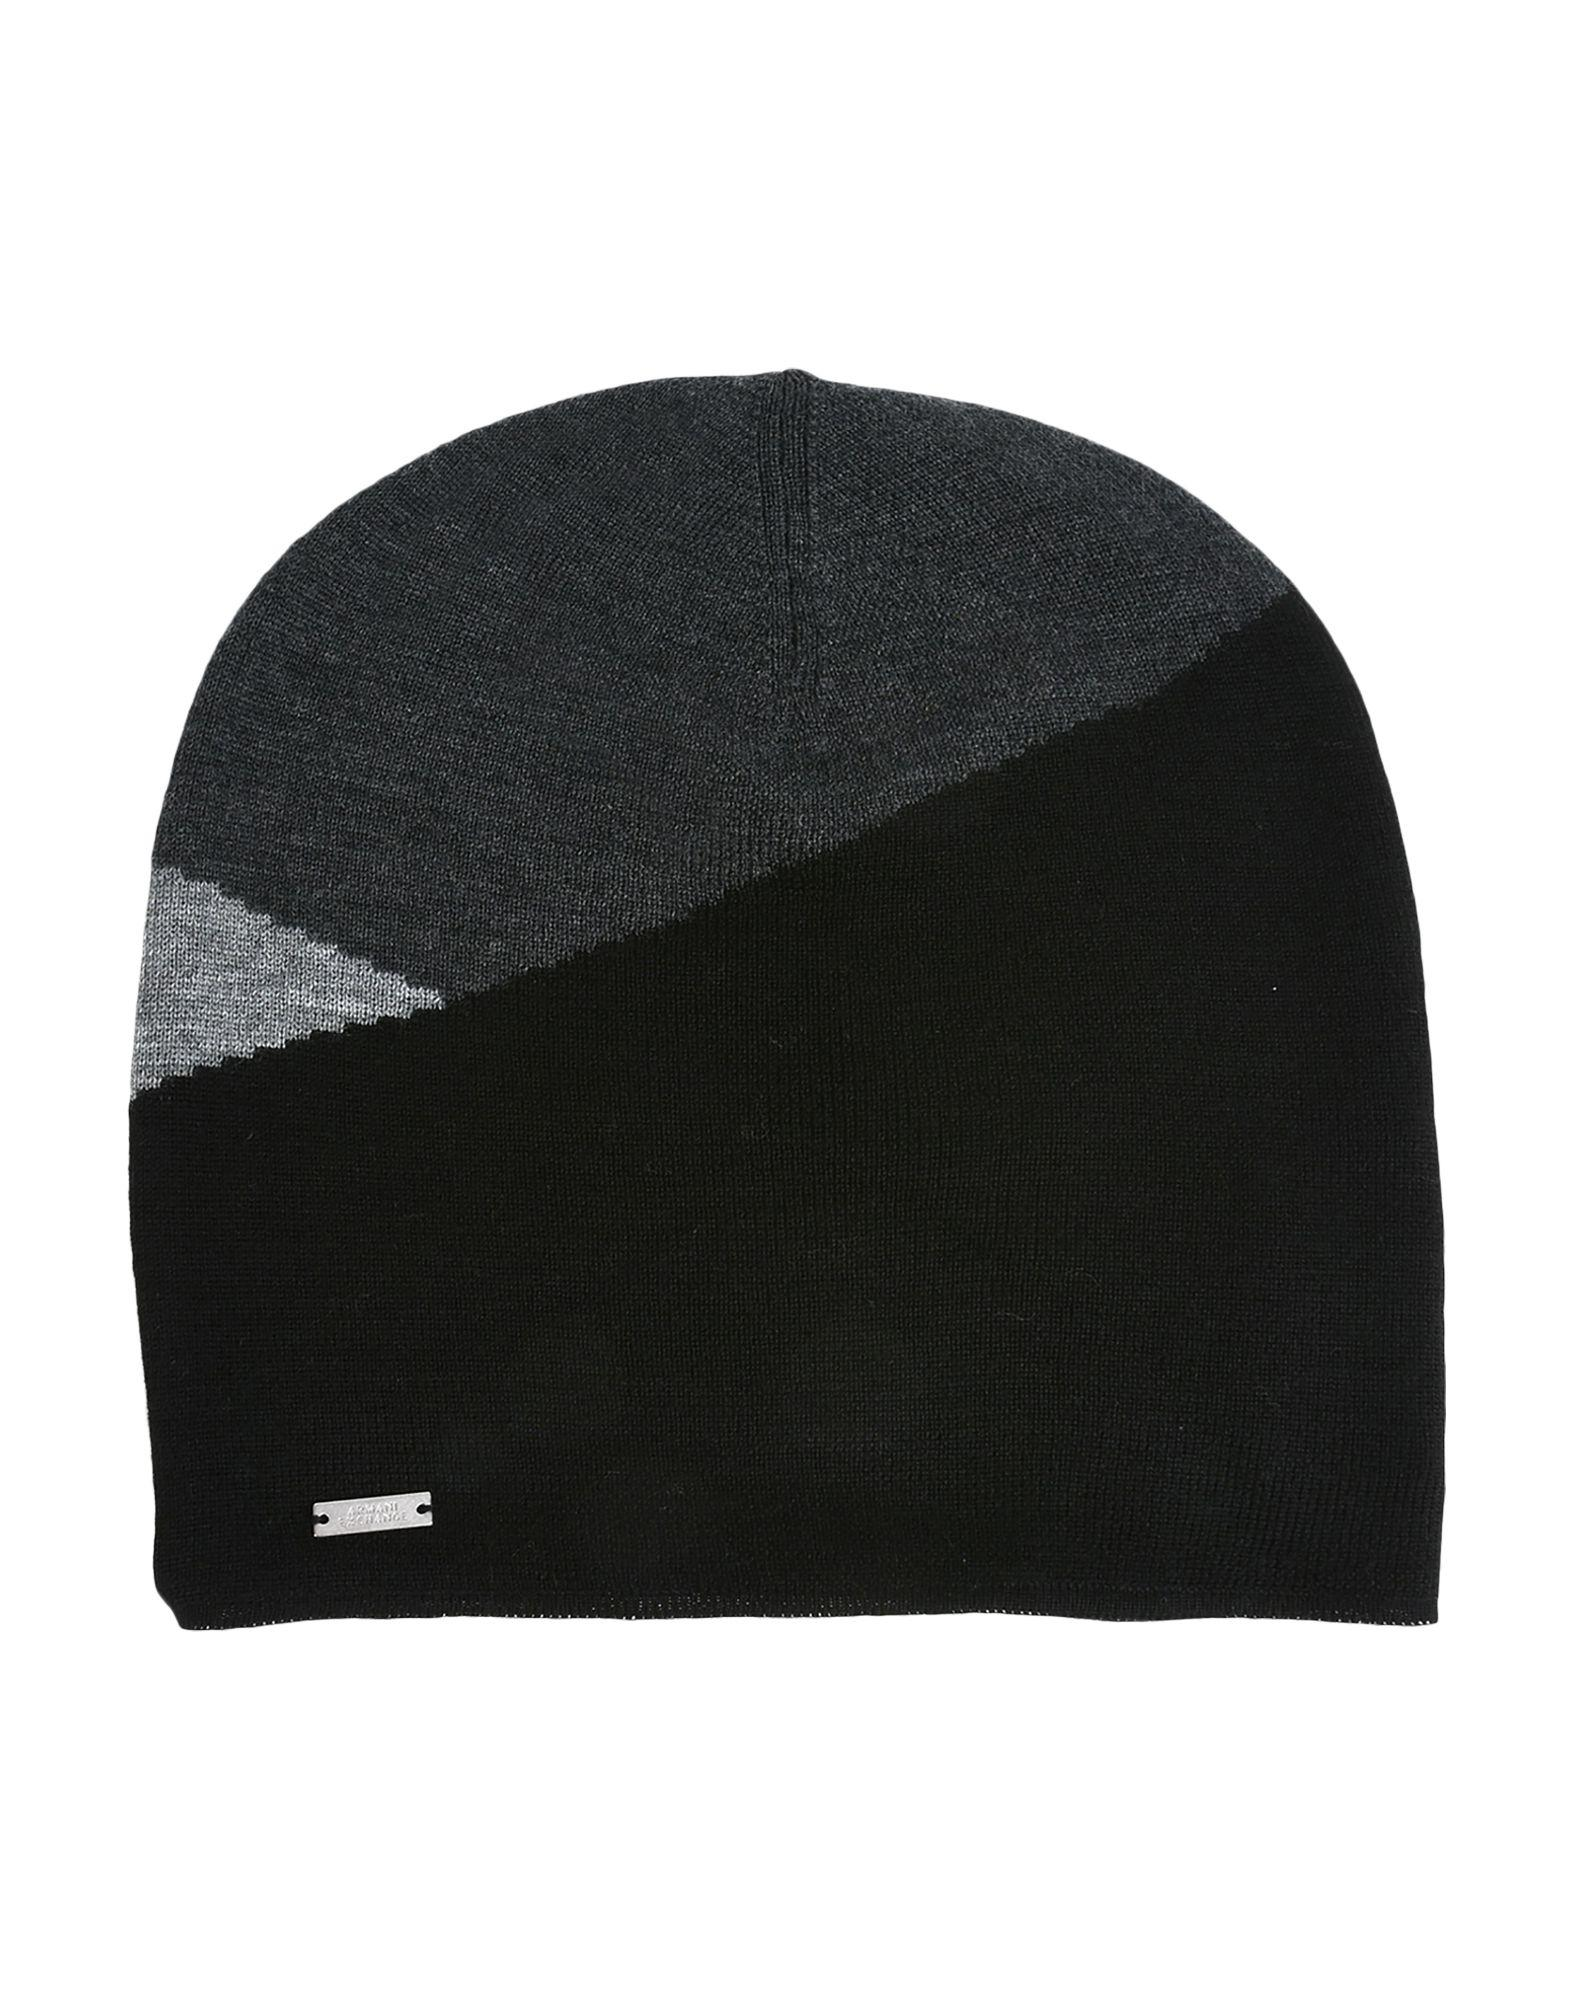 49cd4f370ae Armani Exchange Hat in Black for Men - Lyst